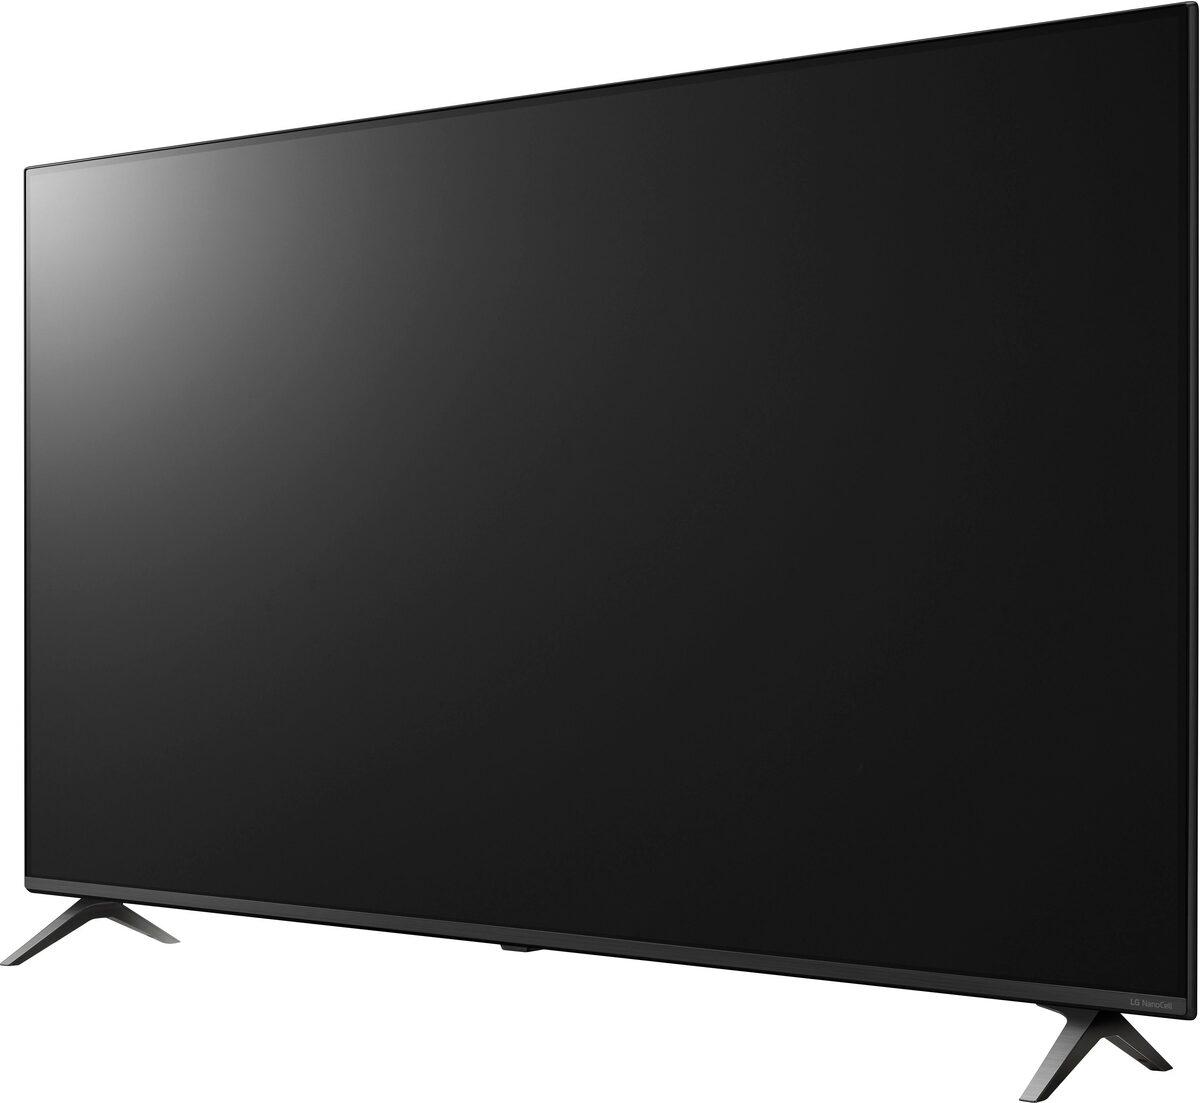 Bild 4 von LG 55SM8050PLC LED-Fernseher (139 cm/55 Zoll, 4K Ultra HD, Smart-TV, NanoCell)